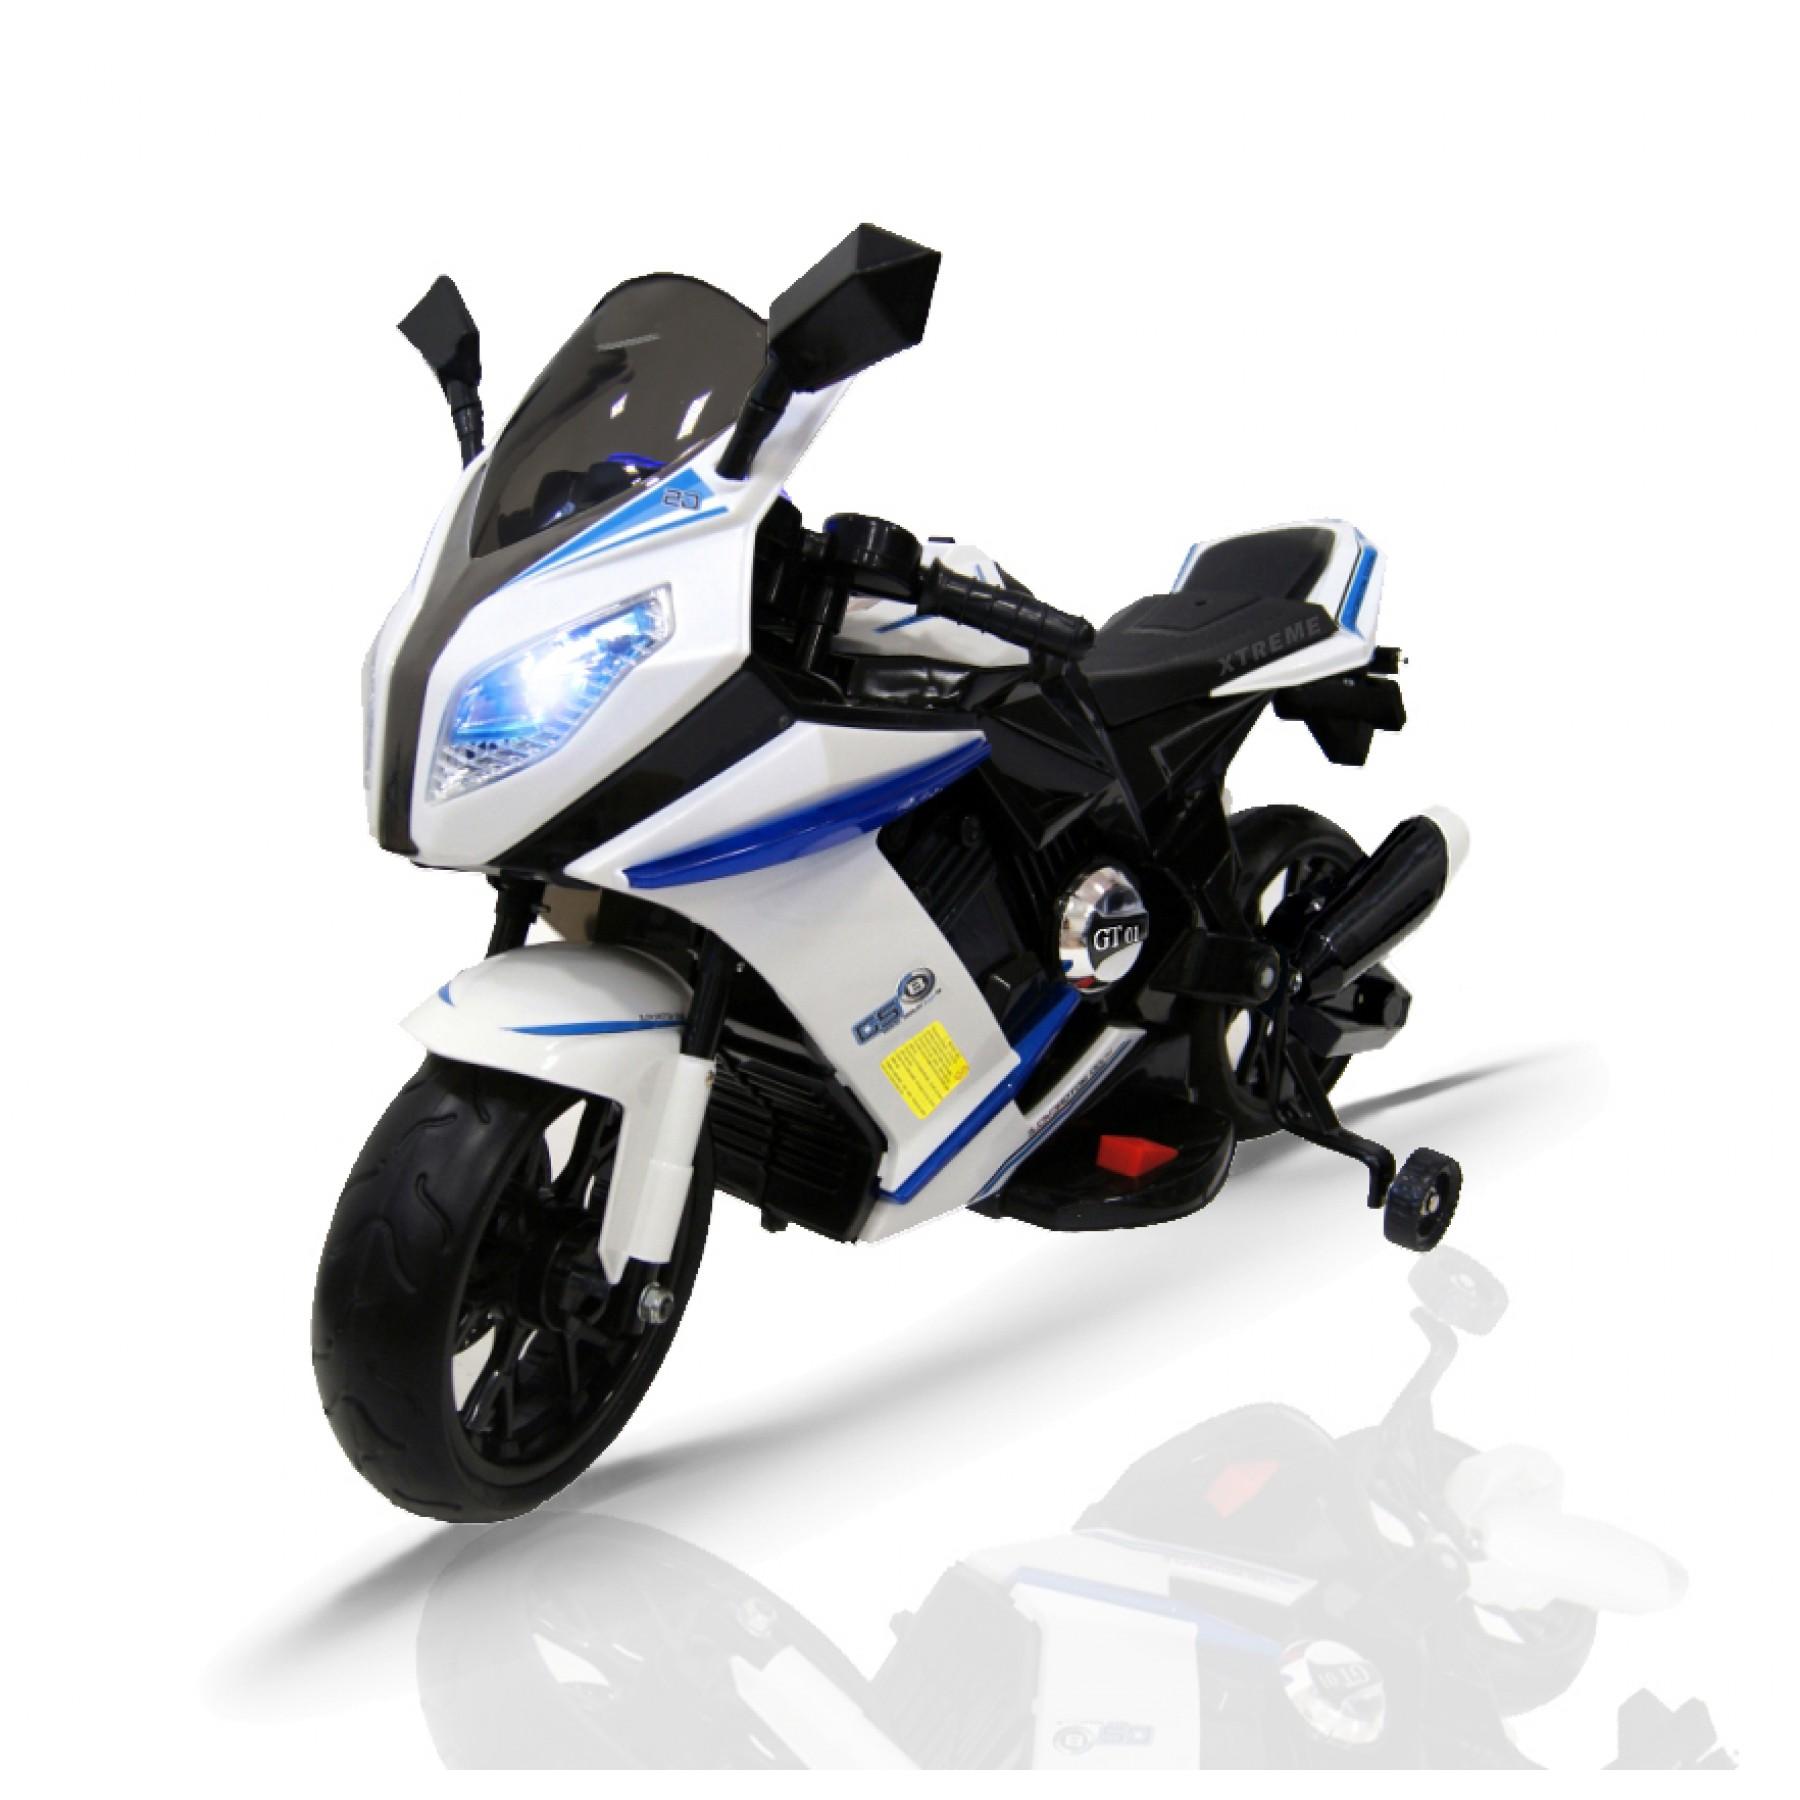 12v Xtreme Electric Motorbike Ride on Road Bike in White